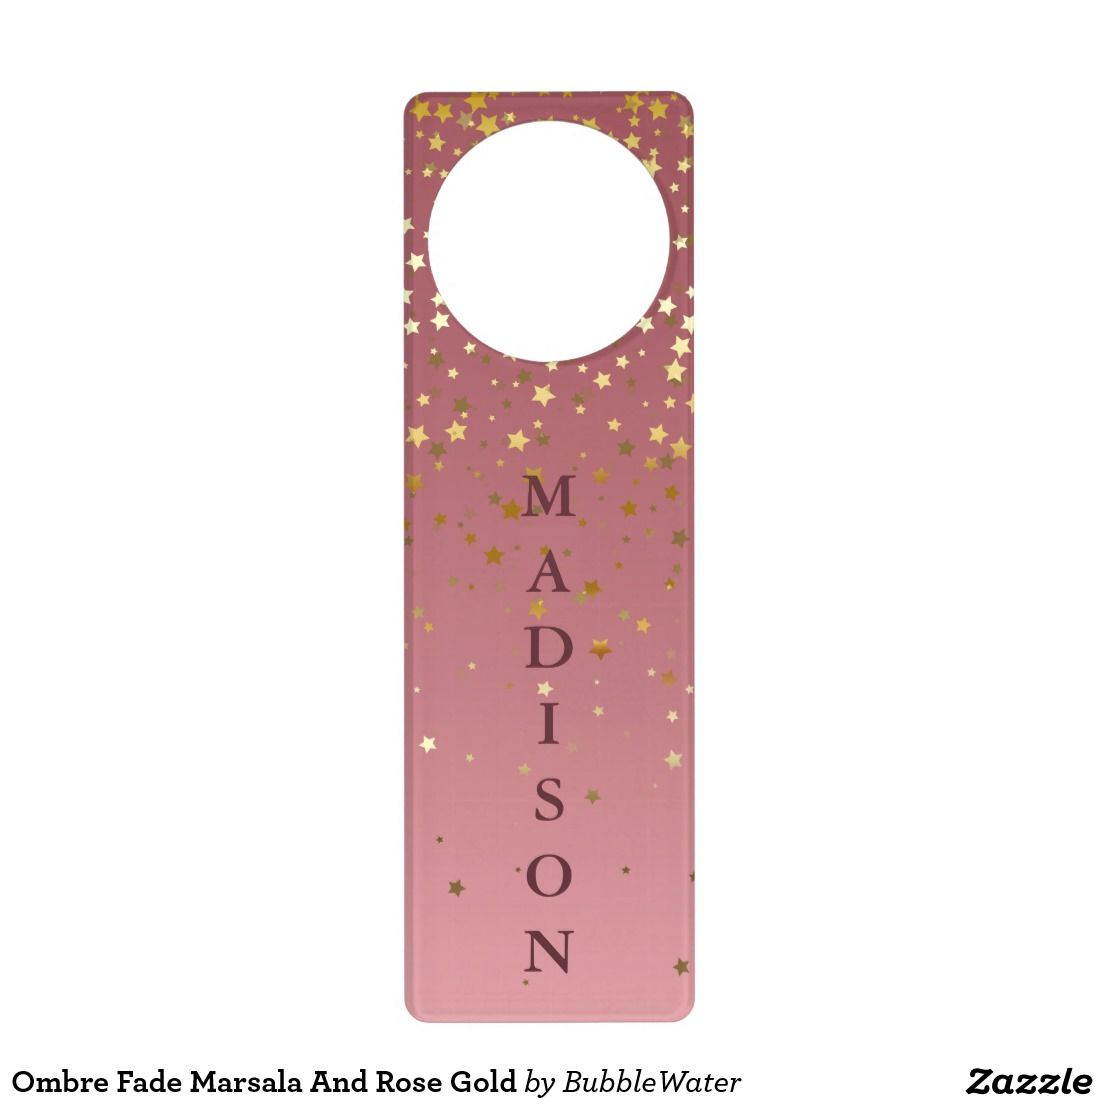 Ombre Fade Marsala And Rose Gold Door Hanger